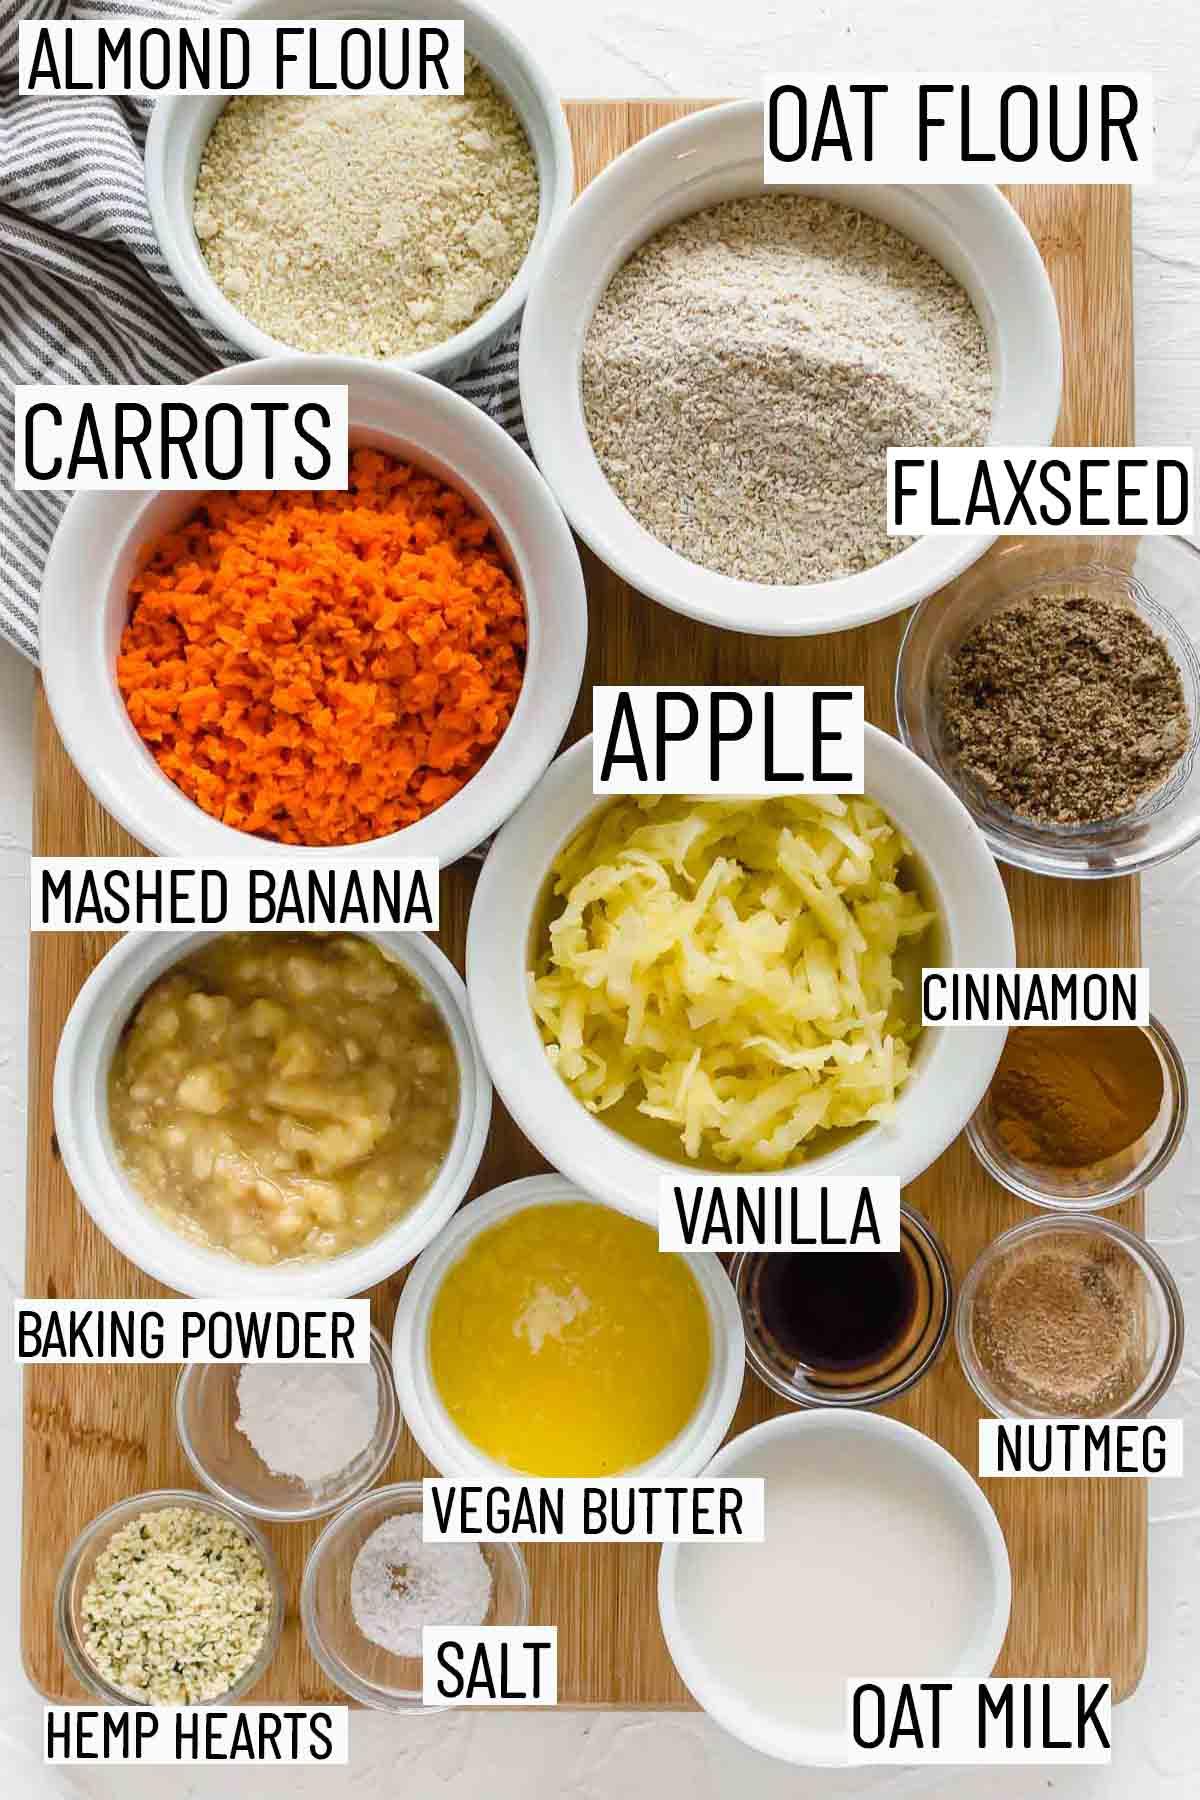 Flat lay image showing portioned recipe ingredients including oat flour, almond flour, apple, carrot, banana, baking powder, salt, hemp hearts, oat milk, nutmeg, vanilla, cinnamon, and flax seed.